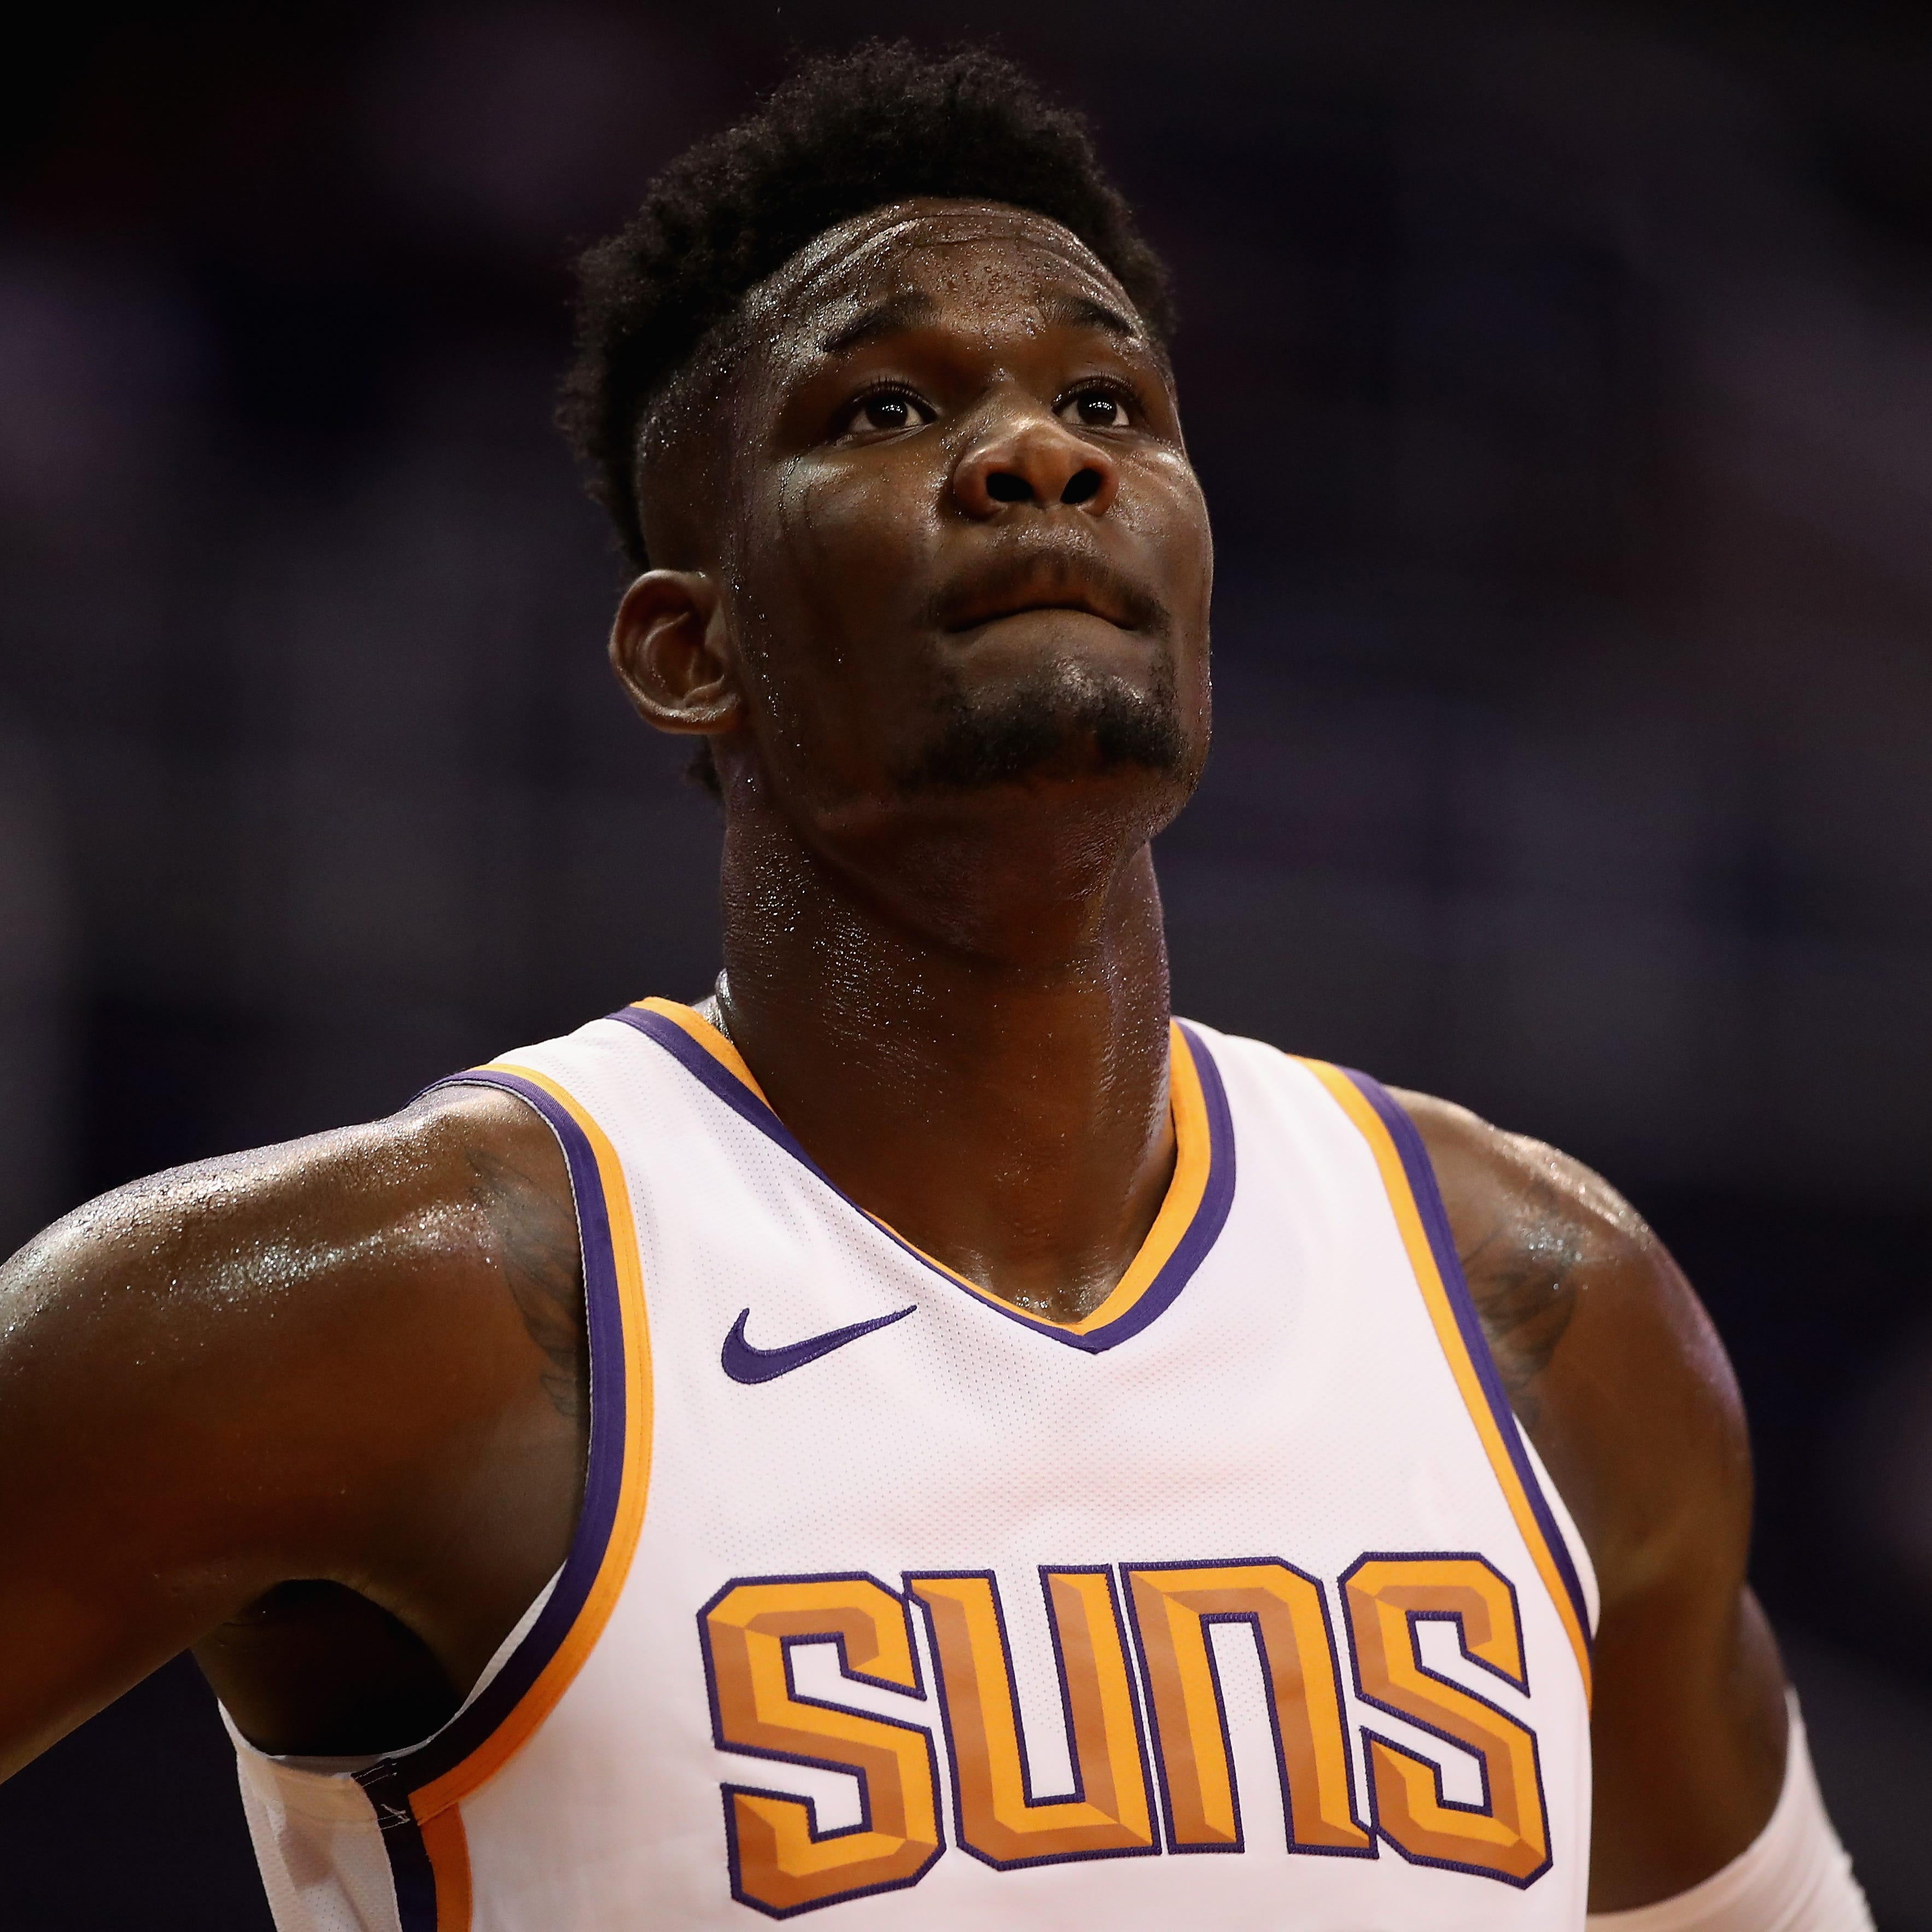 Live updates: Phoenix Suns lead Dallas Mavericks 37-24 after first quarter